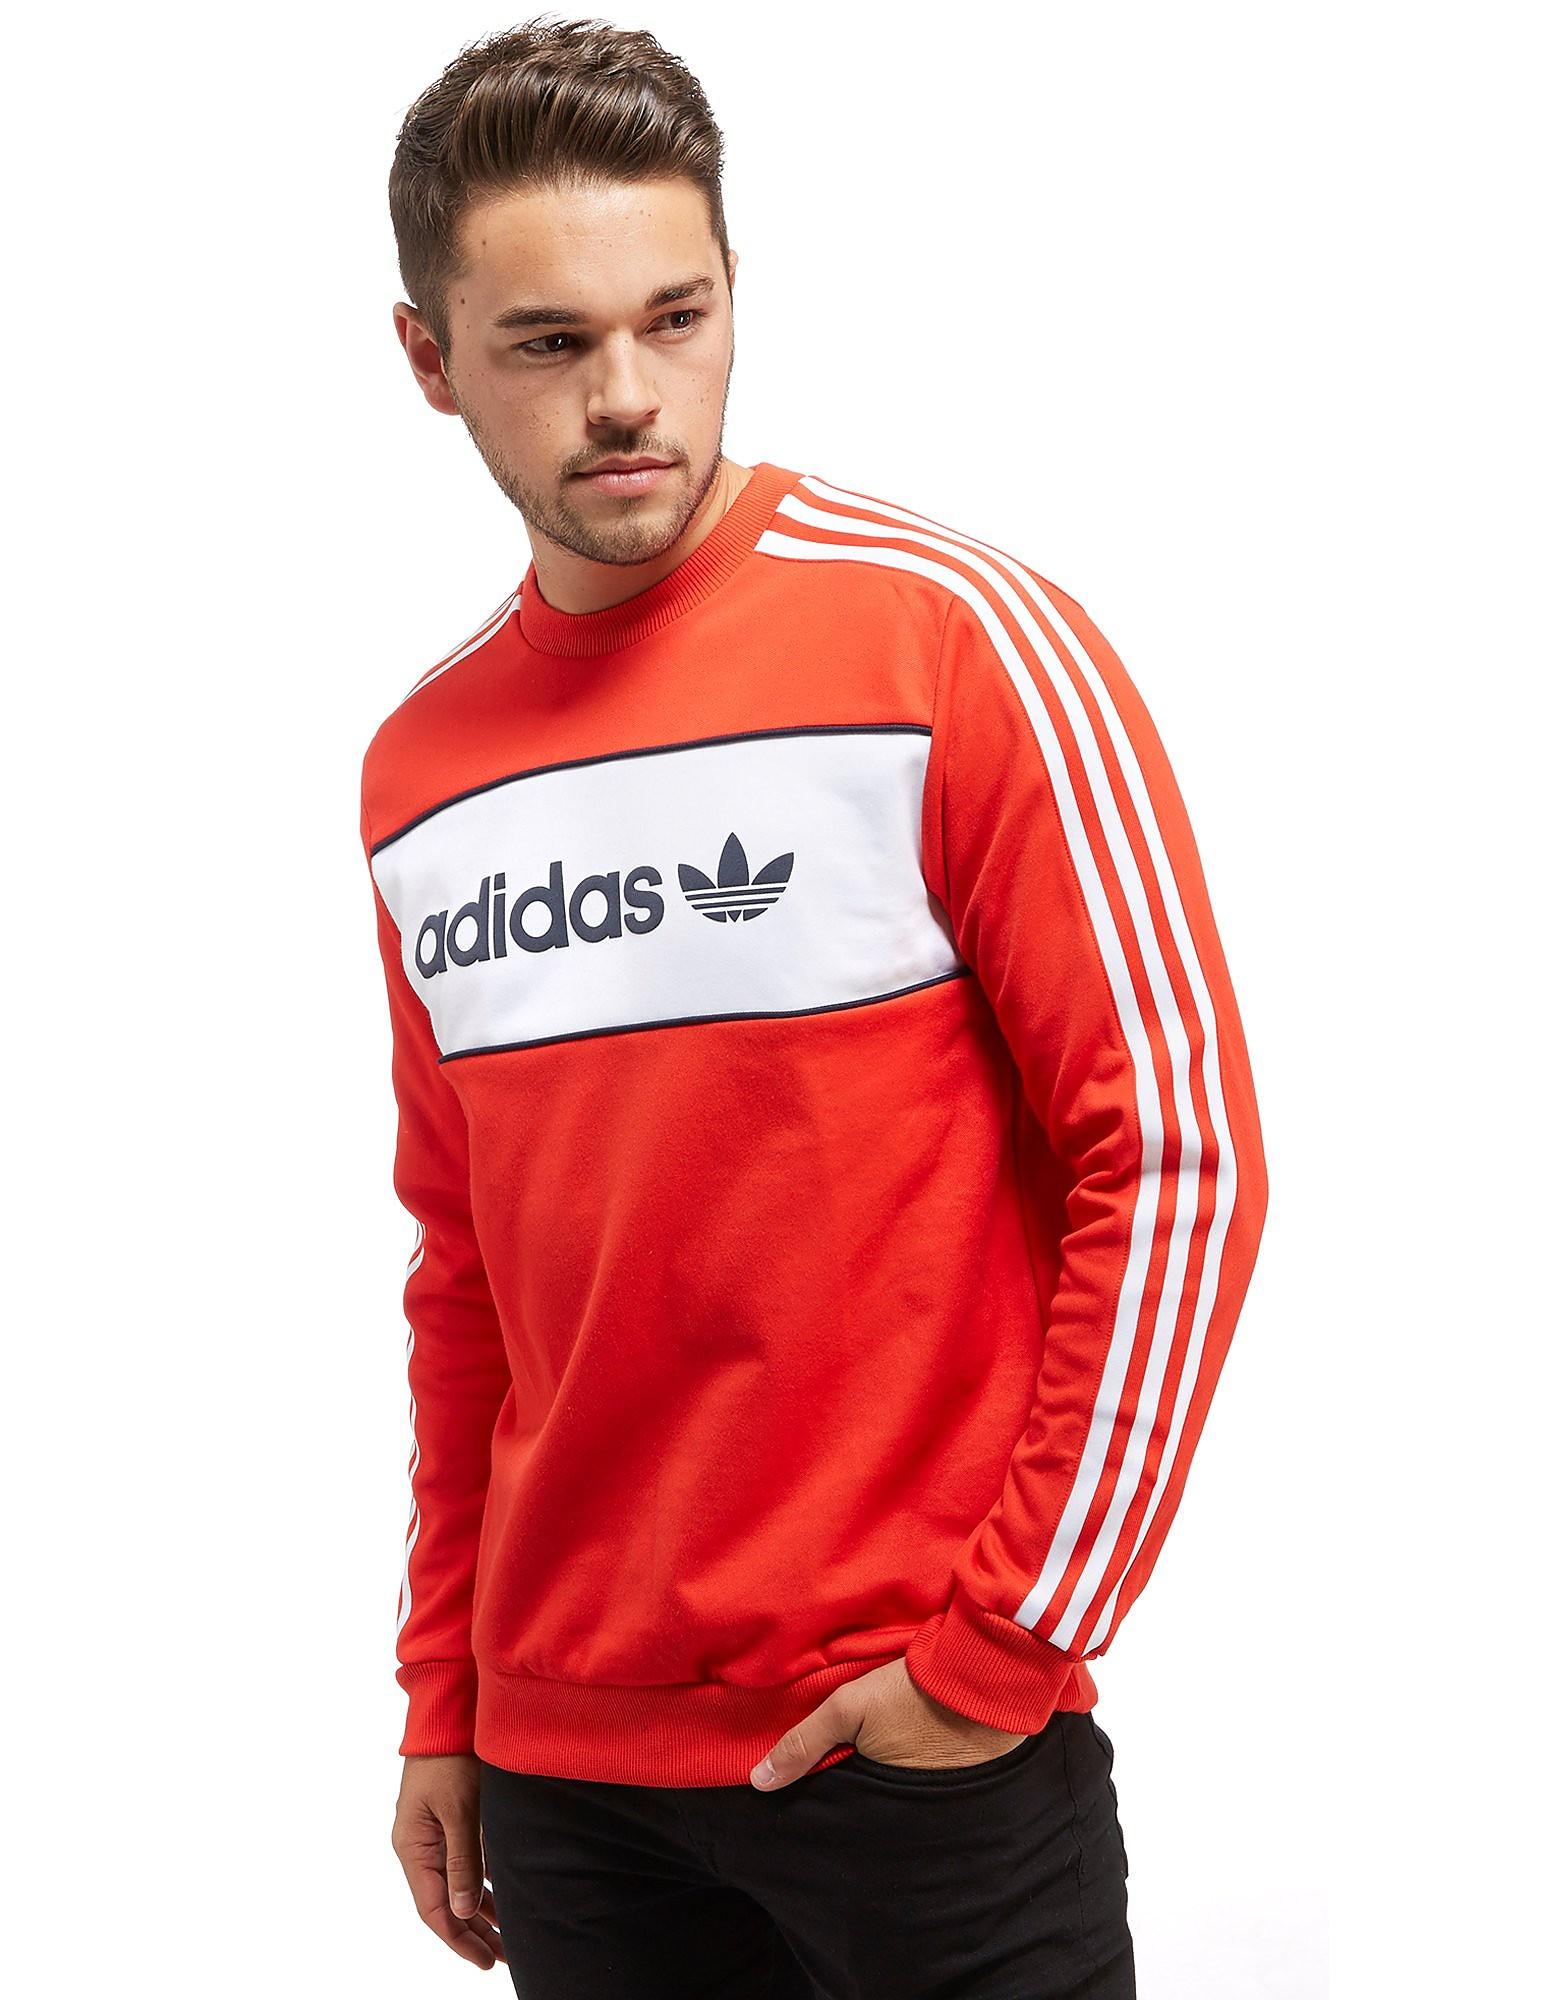 adidas Originals Sweatshirt Block Crew